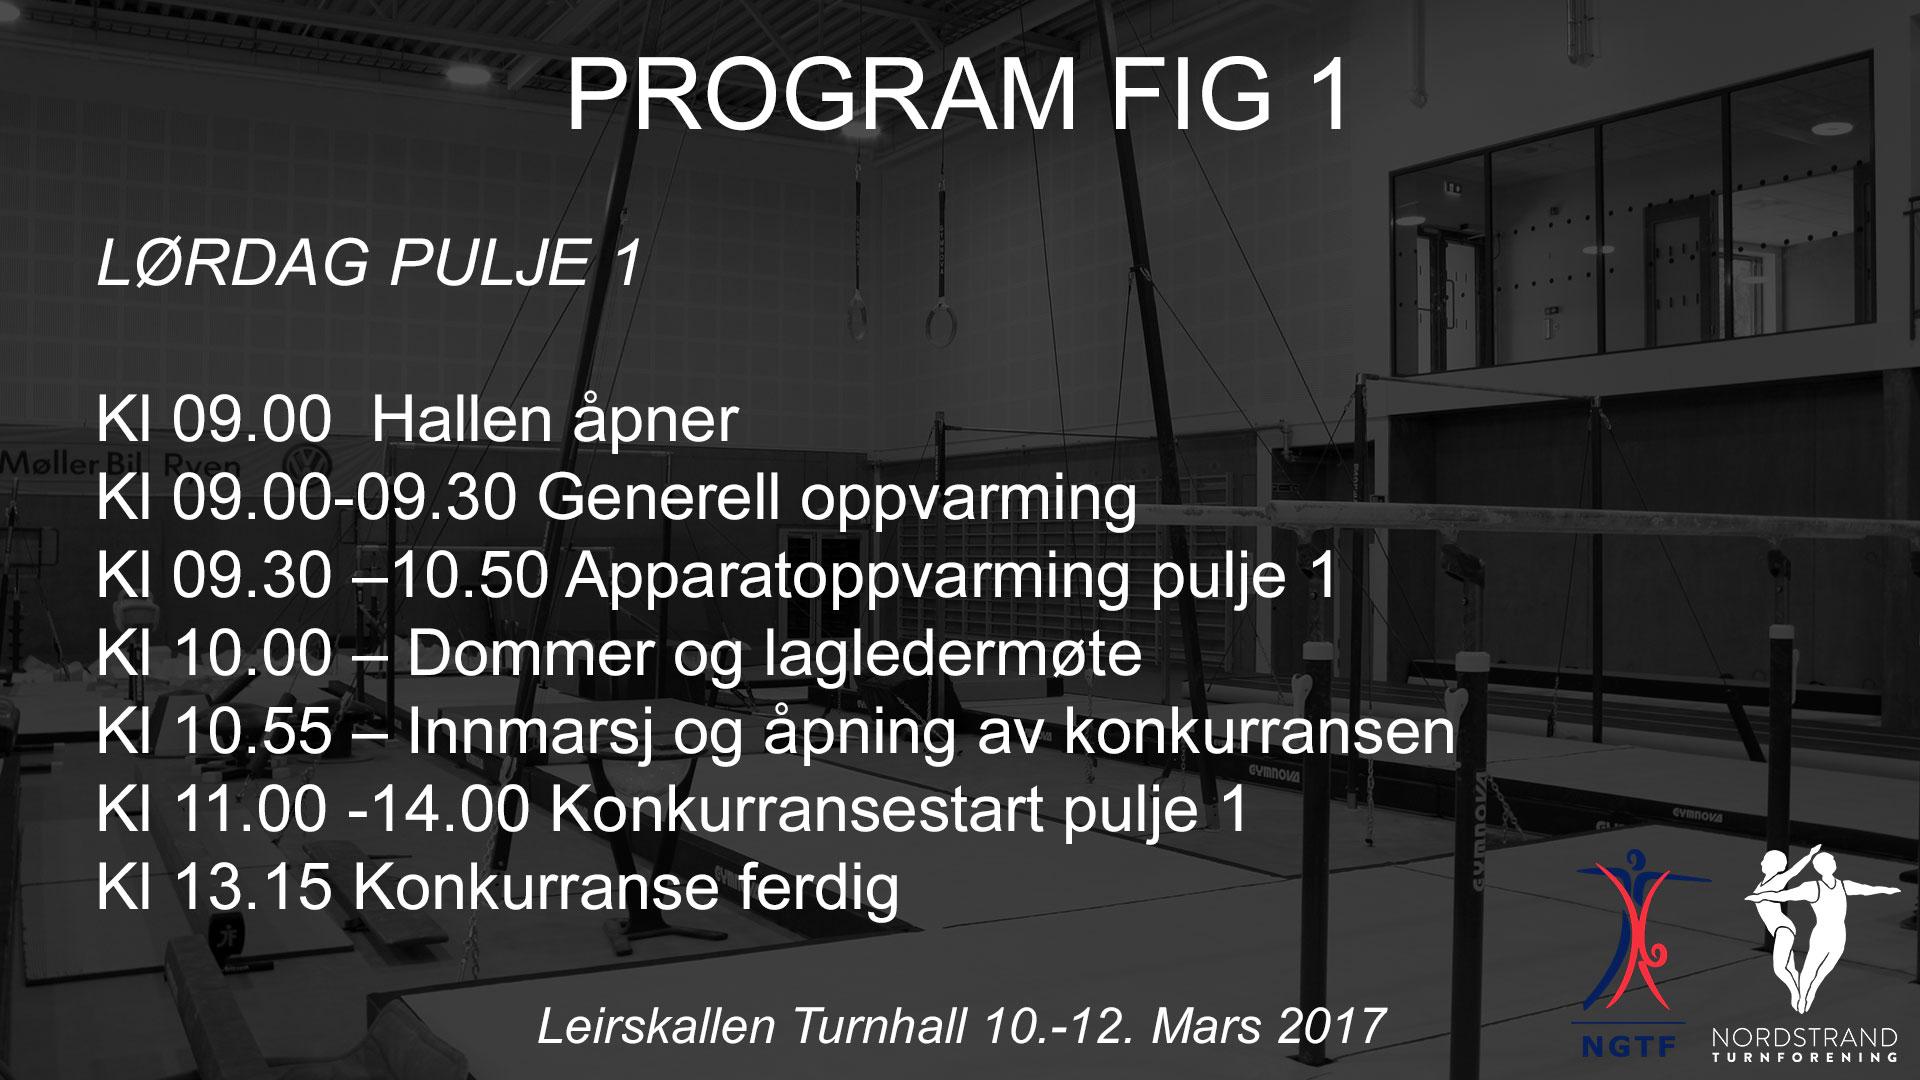 Program-FIG-1-Lørdag-Pulje-1.jpg